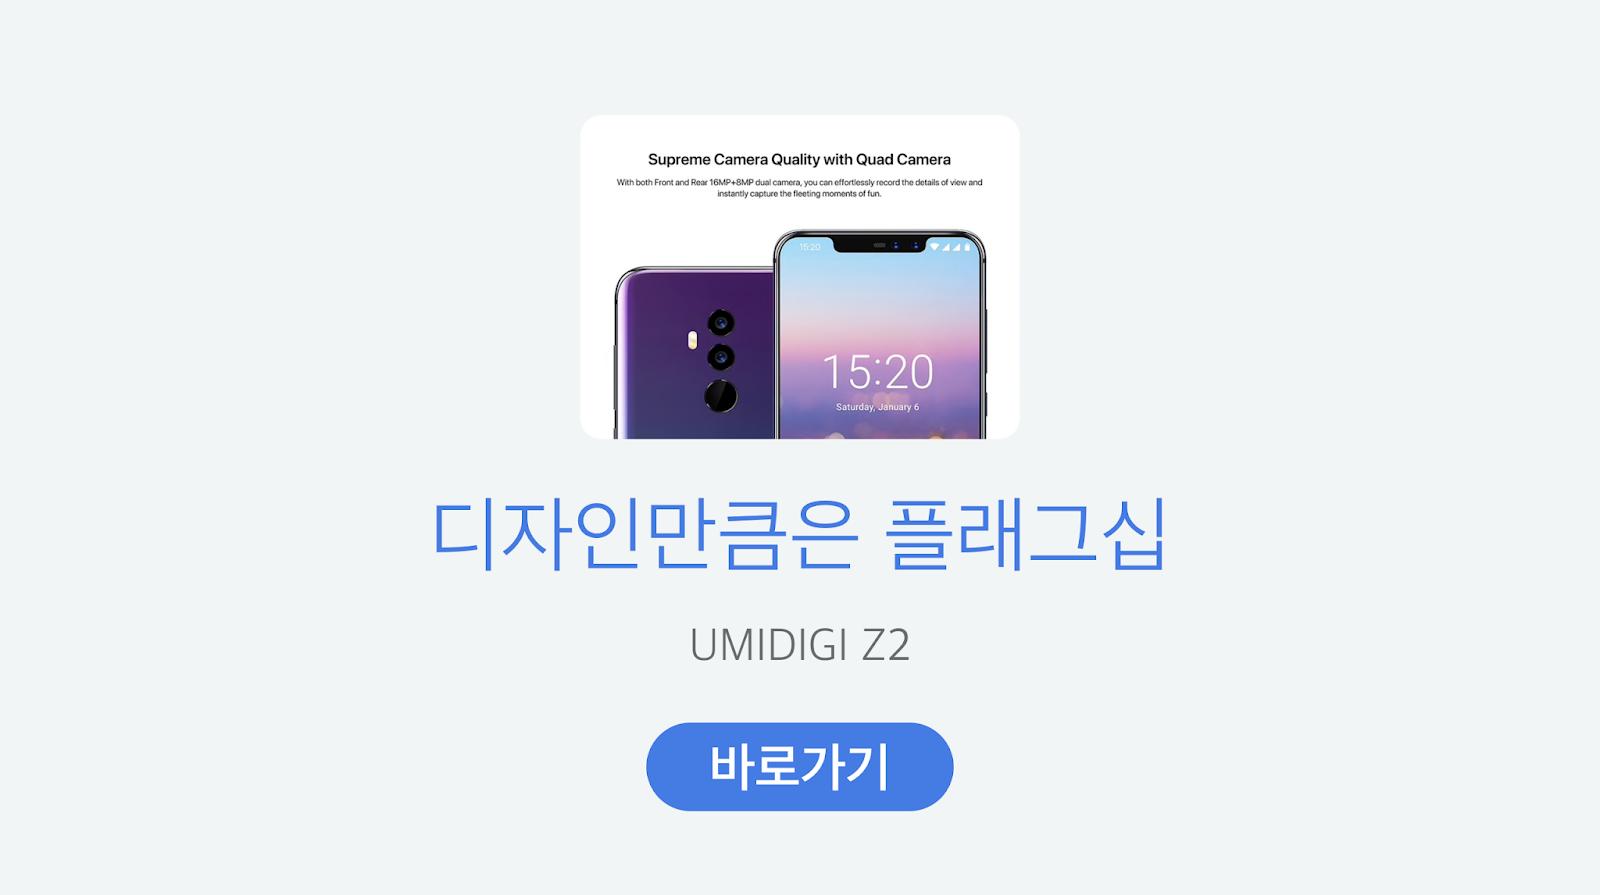 https://www.gearbest.com/cell-phones/pp_1845863.html?lkid=14617449